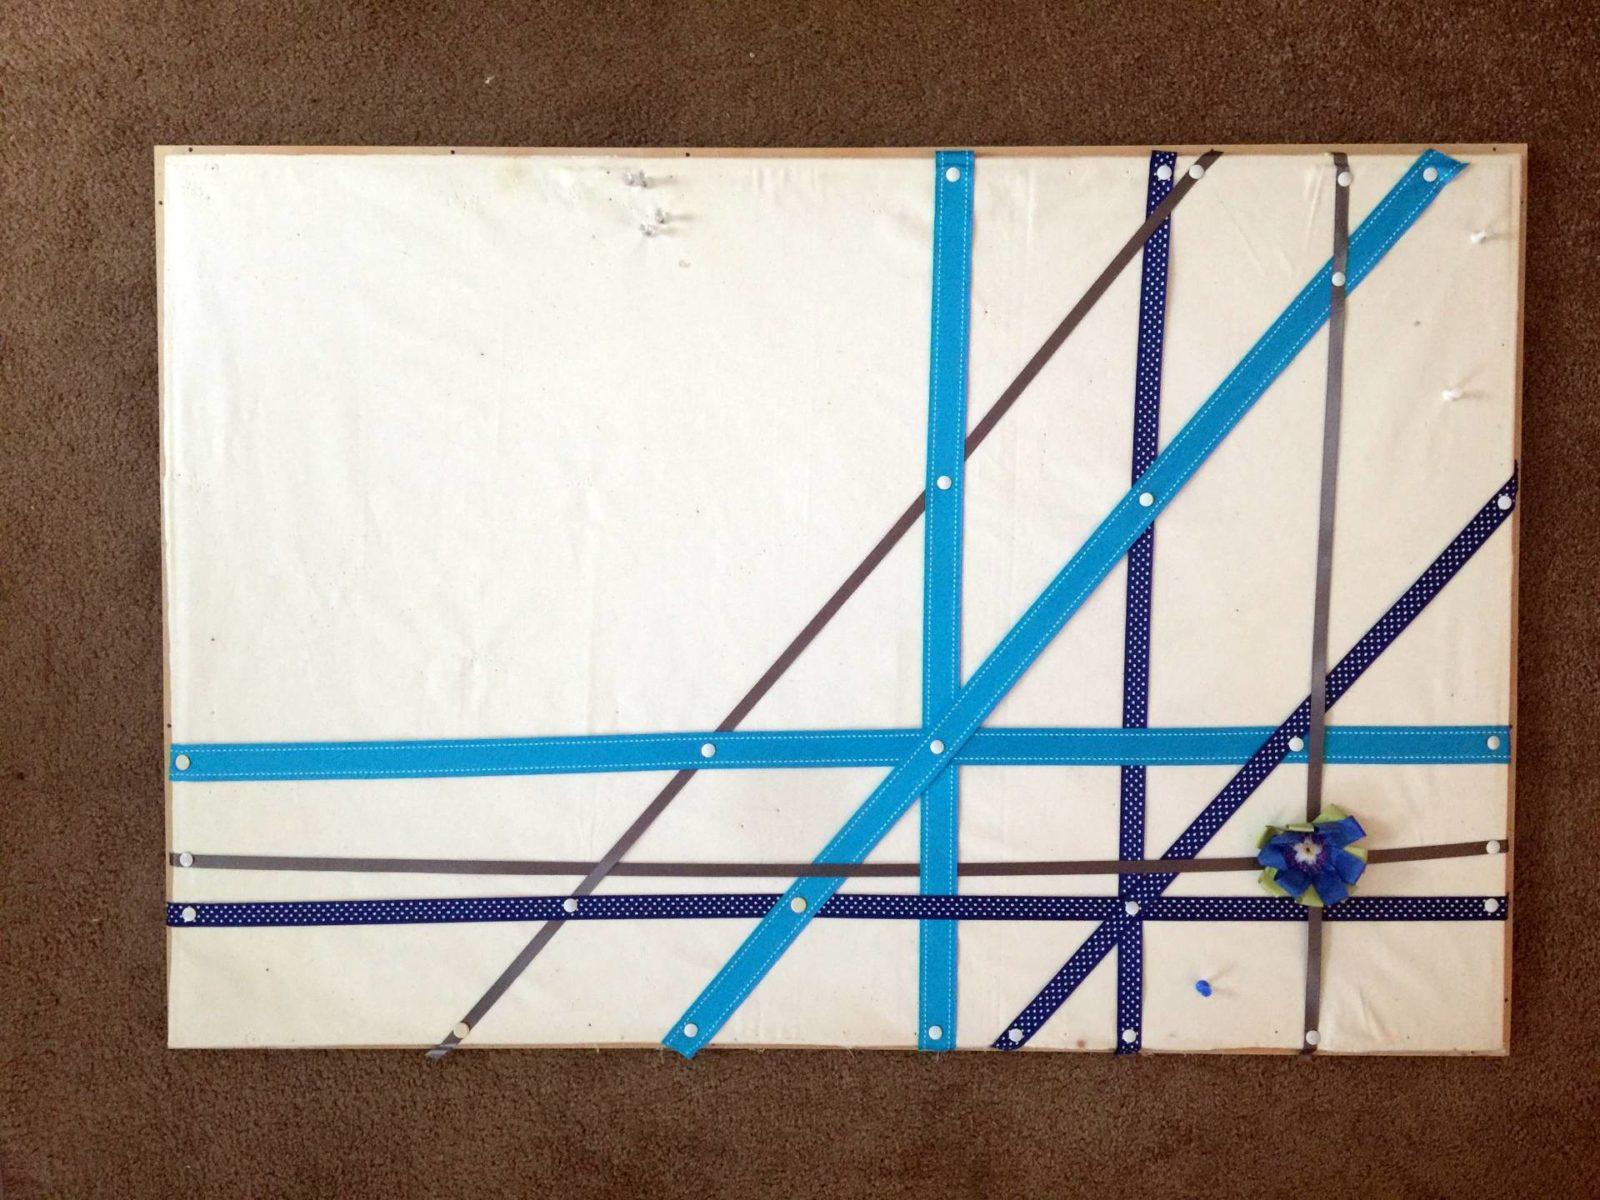 3 14 bulletin board-1